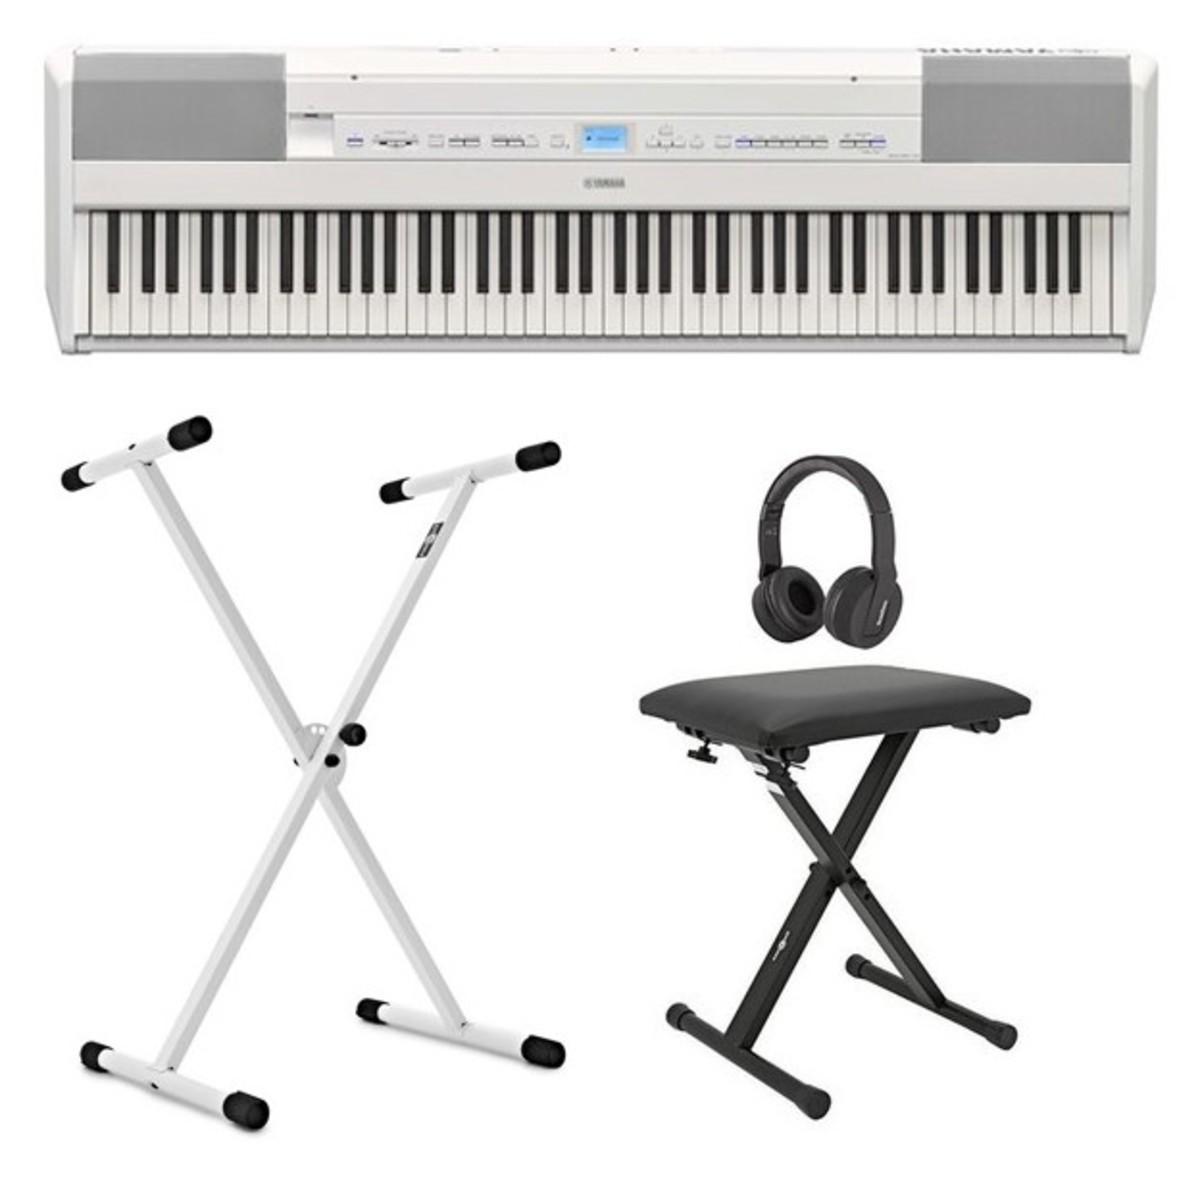 Yamaha P515 Digitalpiano-Paket mit X-Rahmen, Weiß bei Gear4music